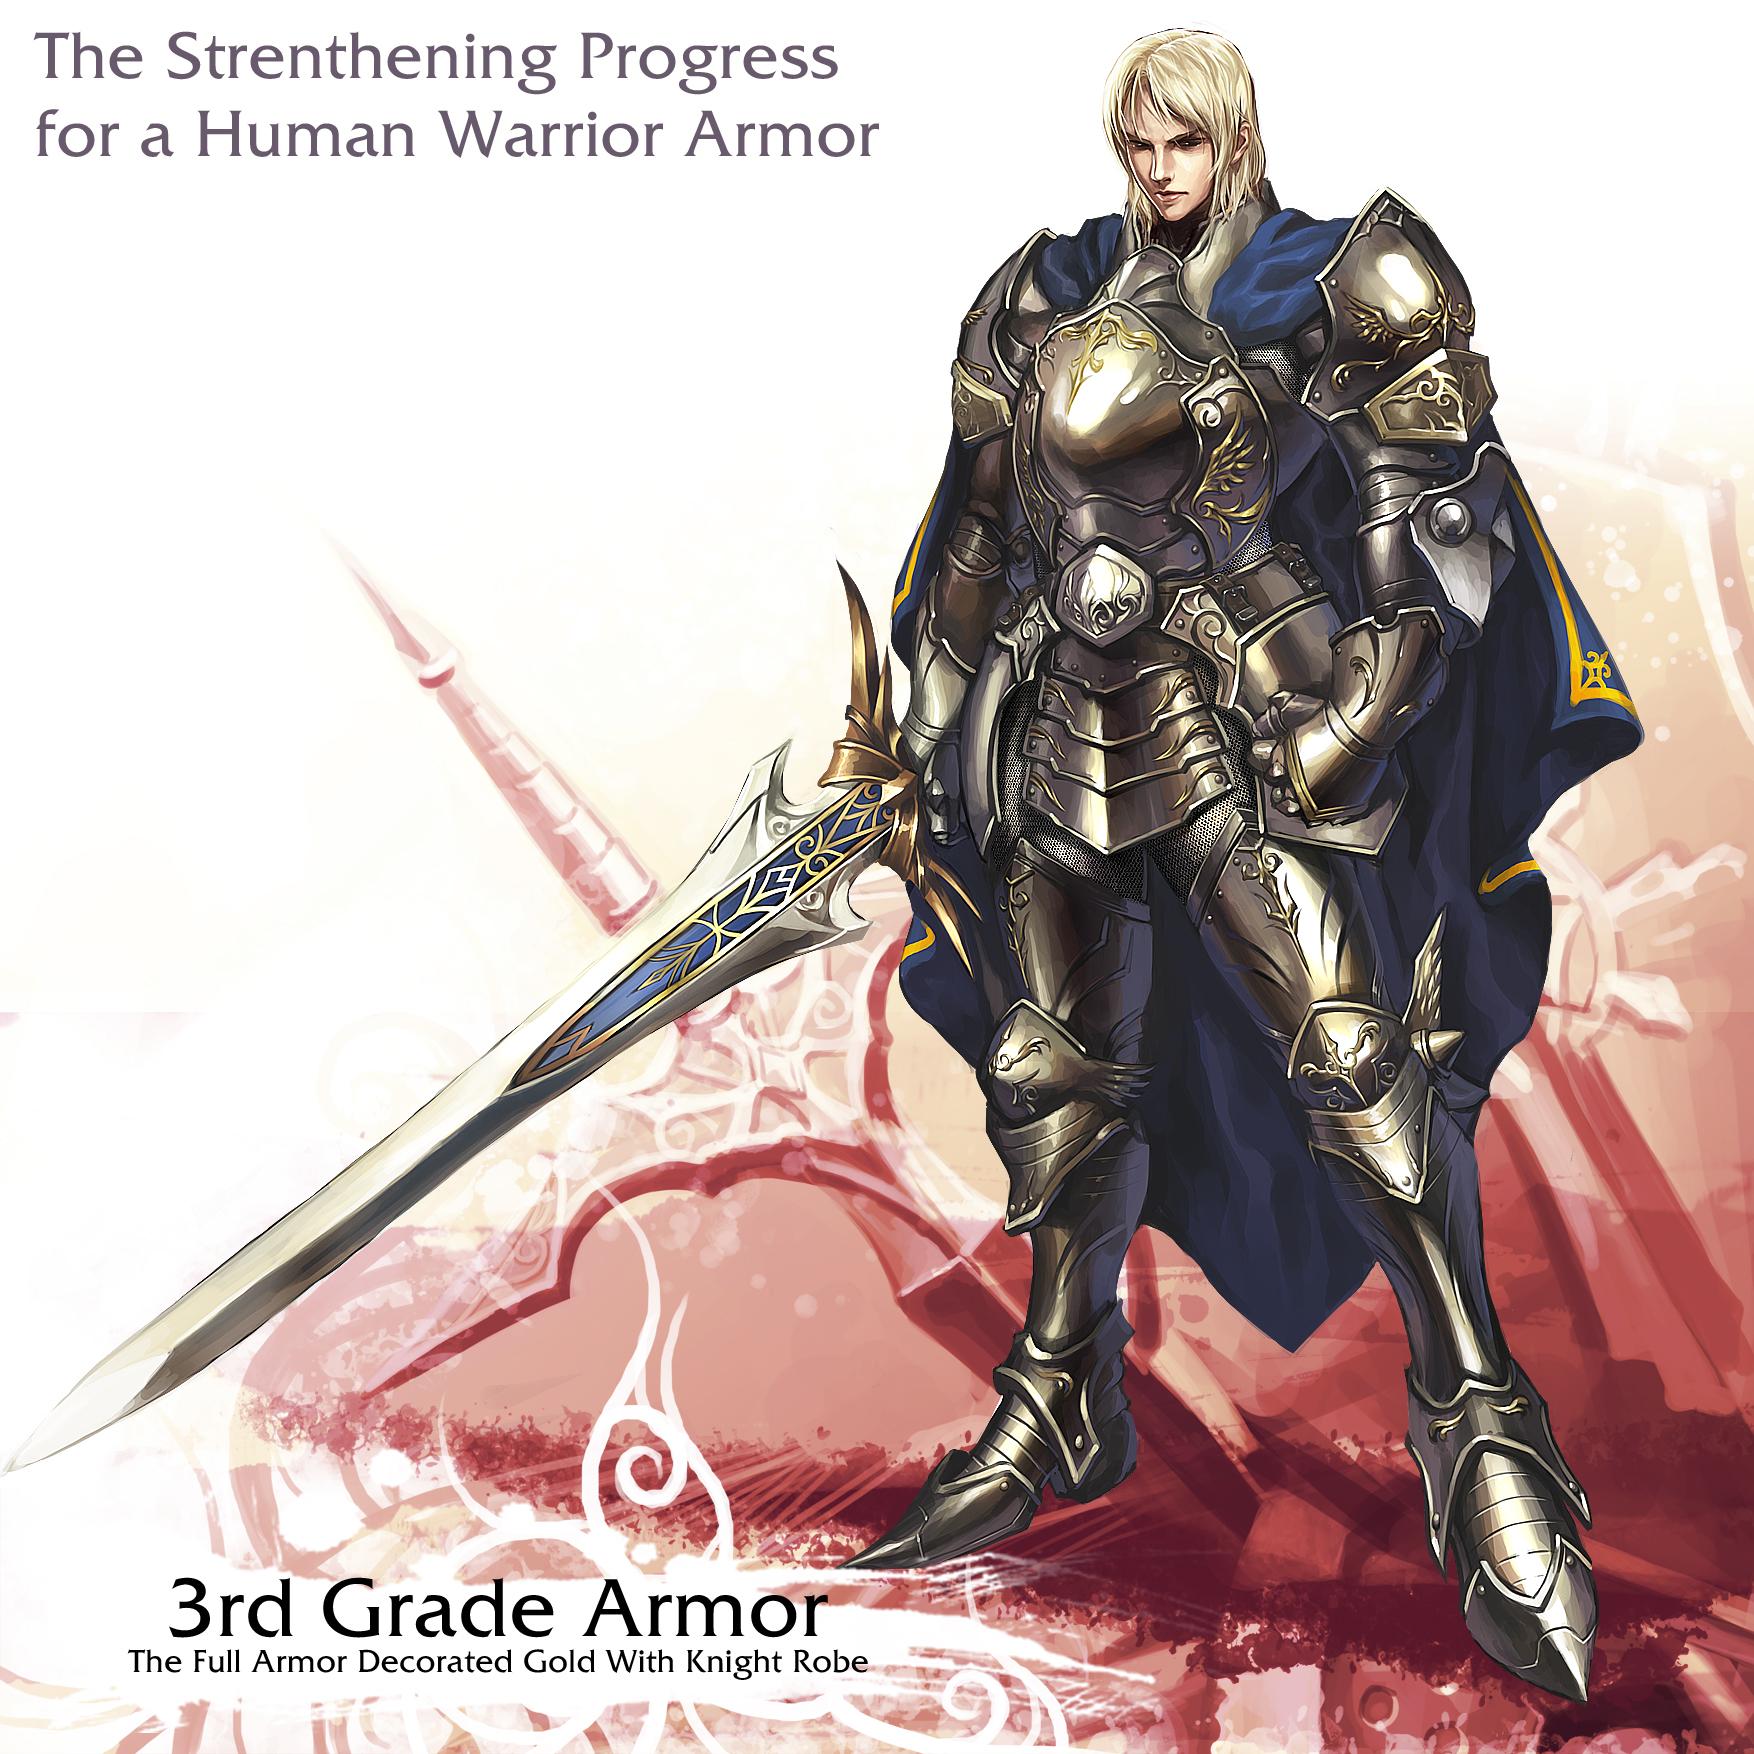 Human Warrior 3rd armor